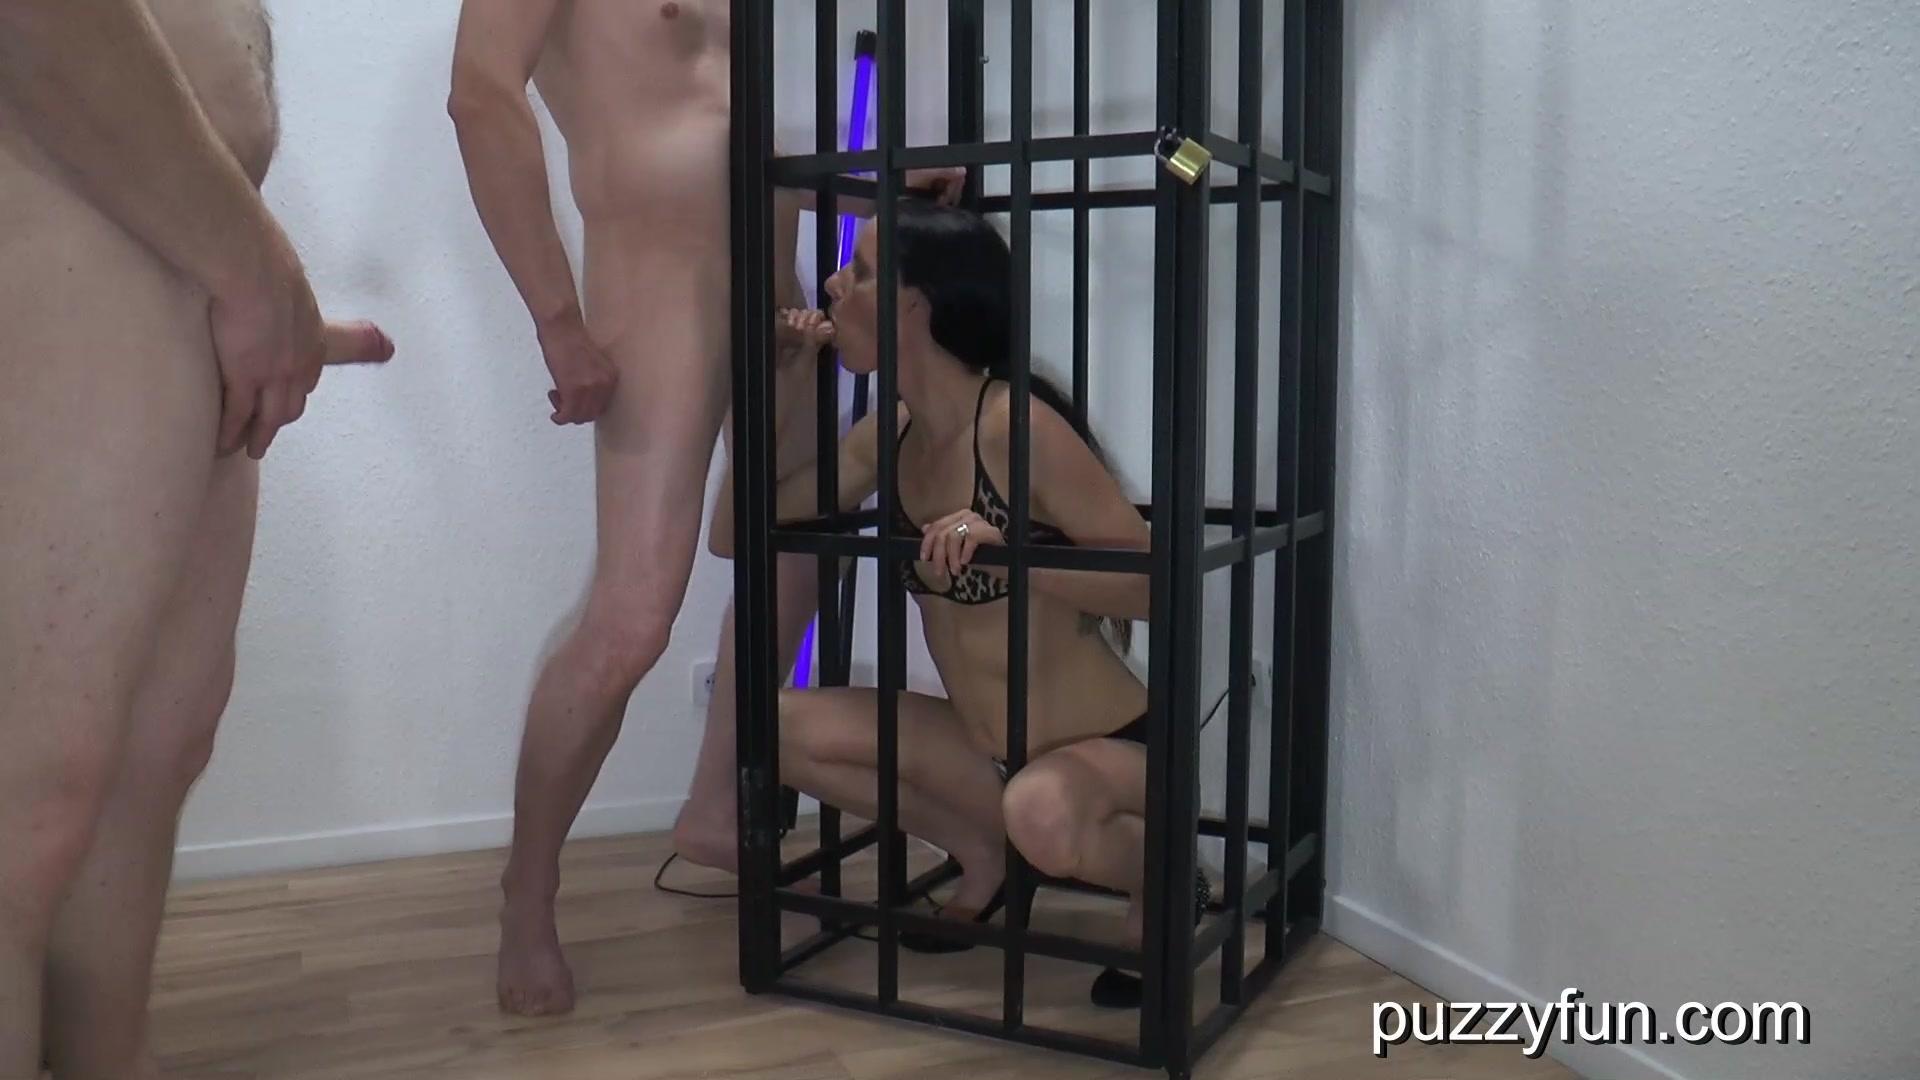 Randvoll sperma pussy beschriftungen mit